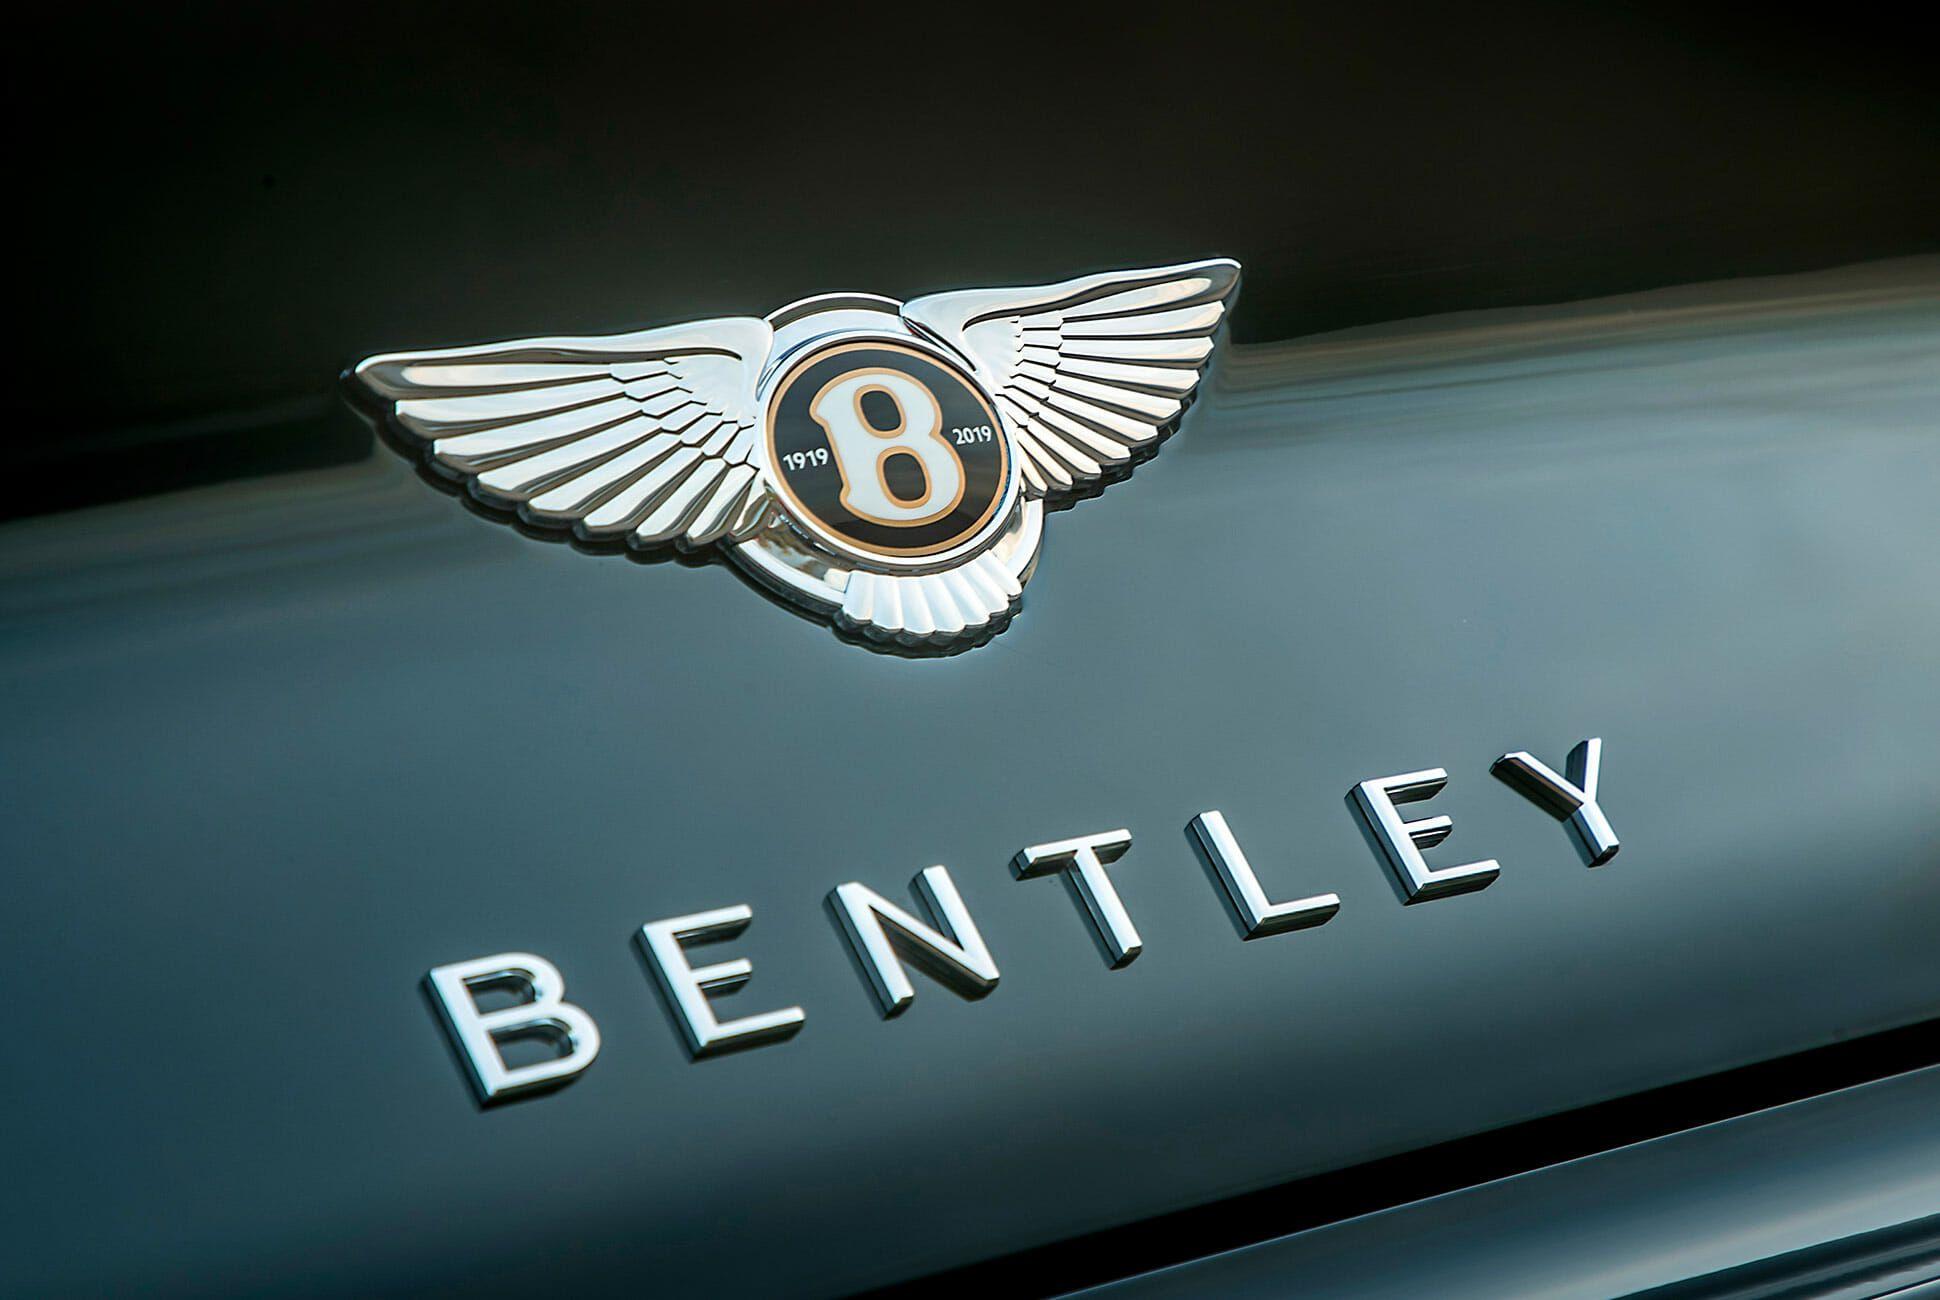 Bentley-Continental-GTC-Review-gear-patrol-slide-6